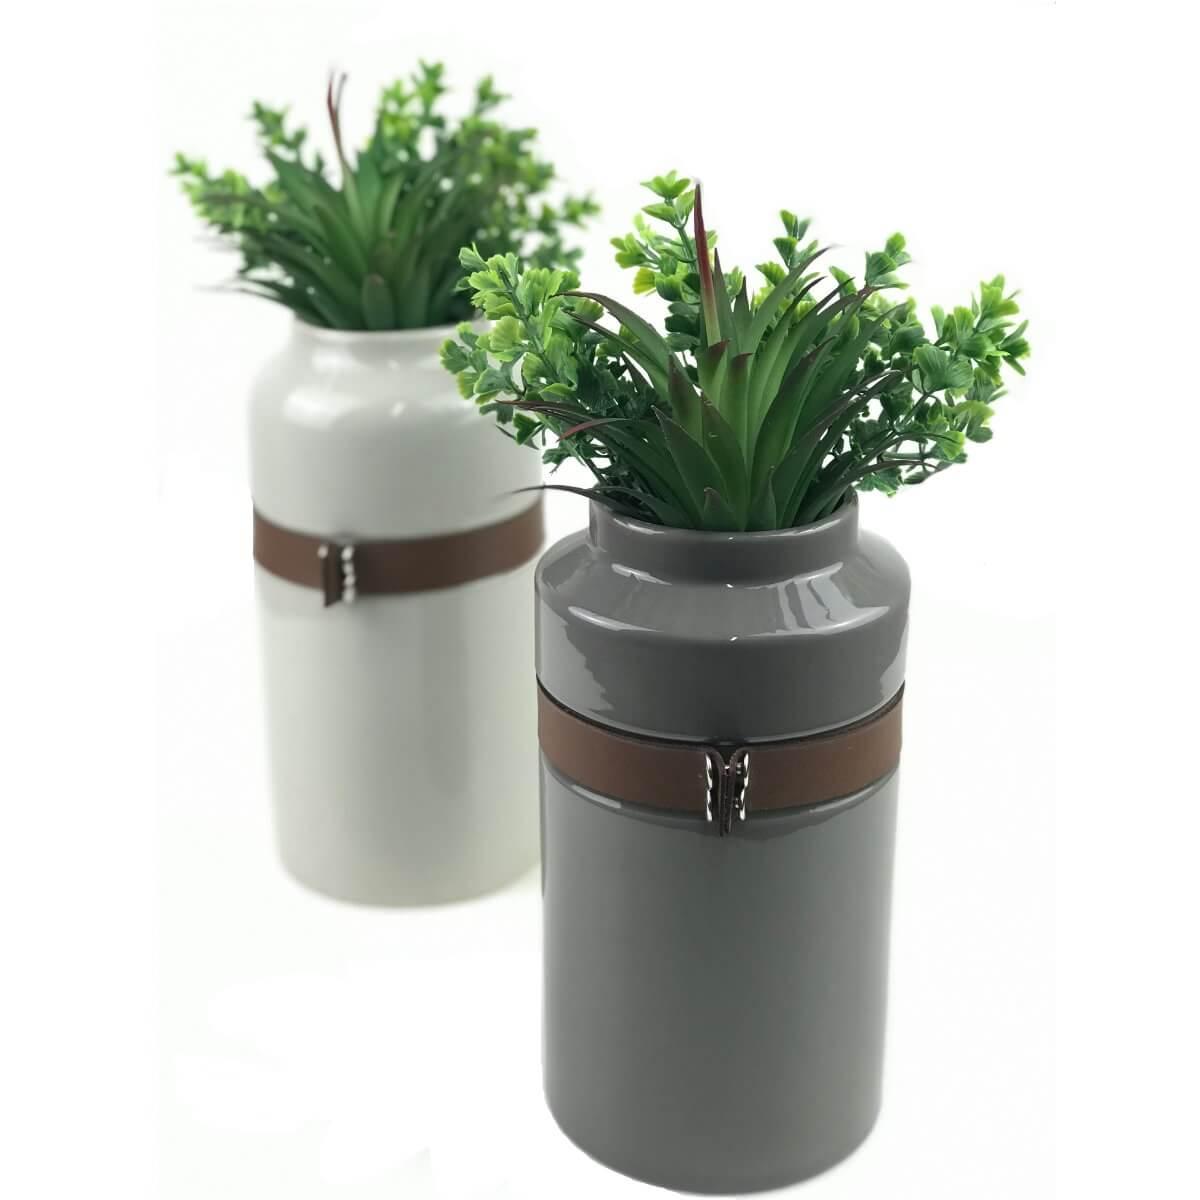 Vaso de Ceramica com Cinto de Couro - Cinza Claro